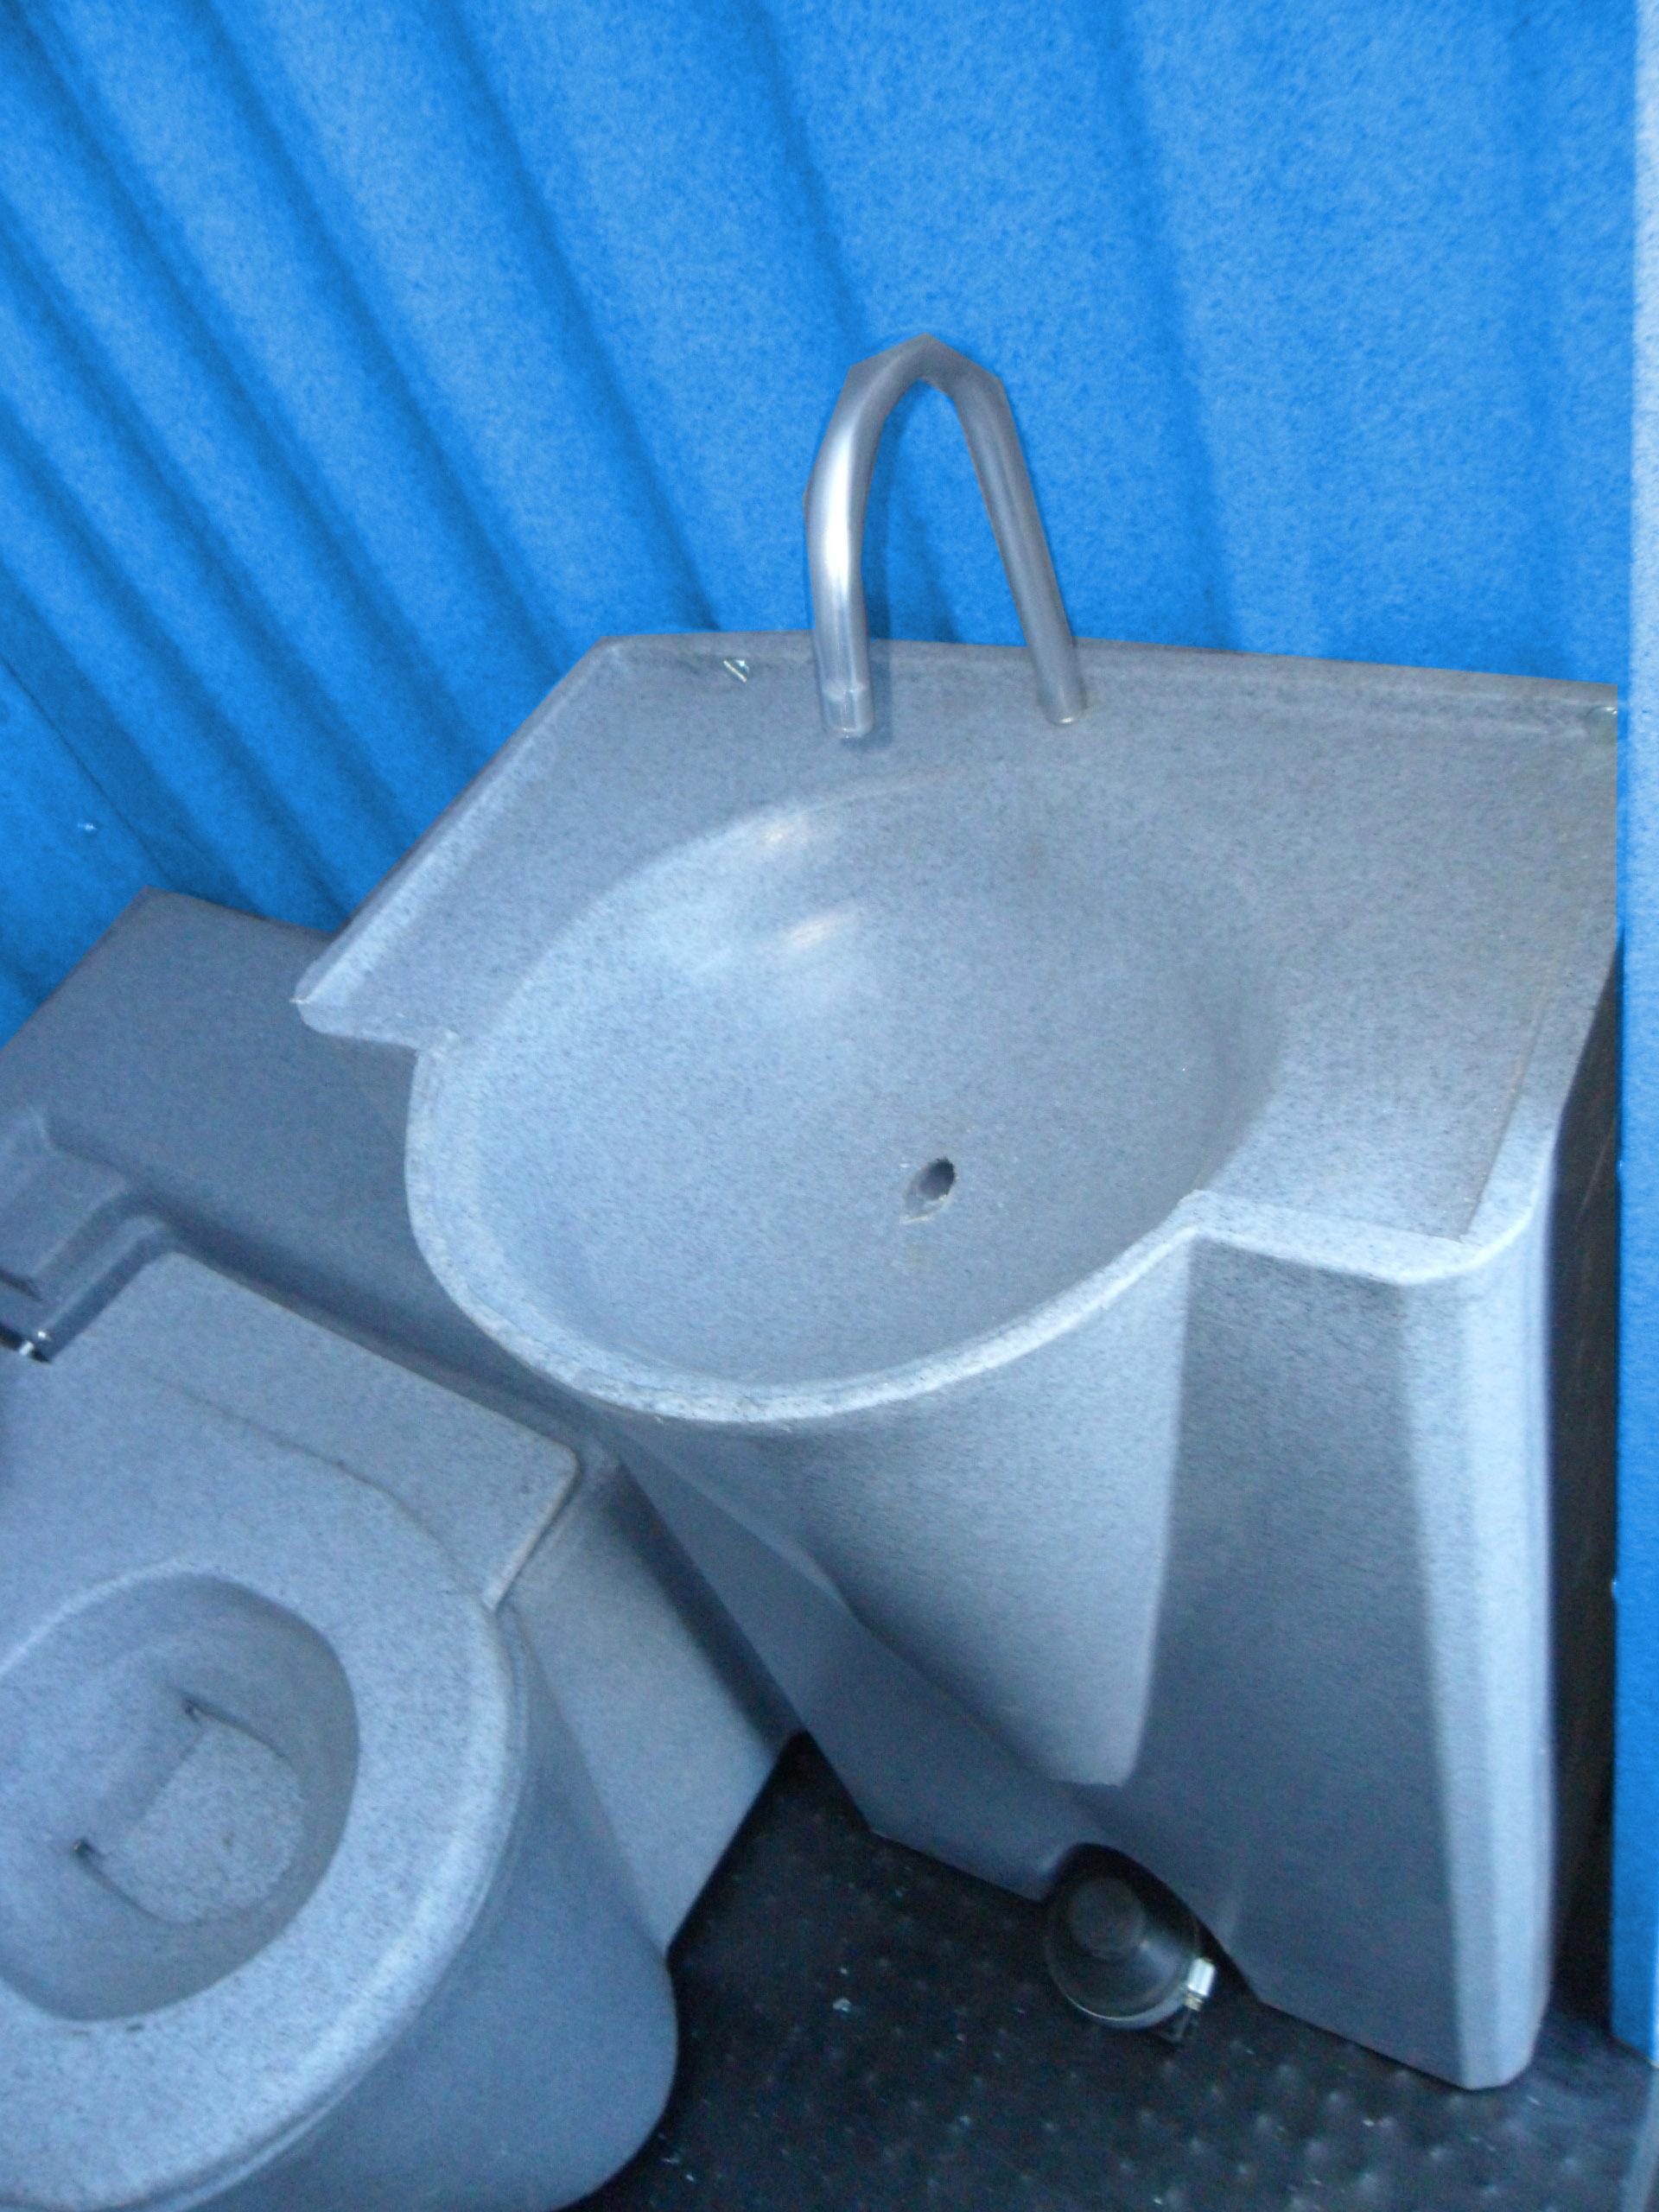 #1A6BB1 Plastic Ambiental Indústria de Materiais Plásticos Ltda. 1920x2560 px Banheiro Ideal Ltda 3001